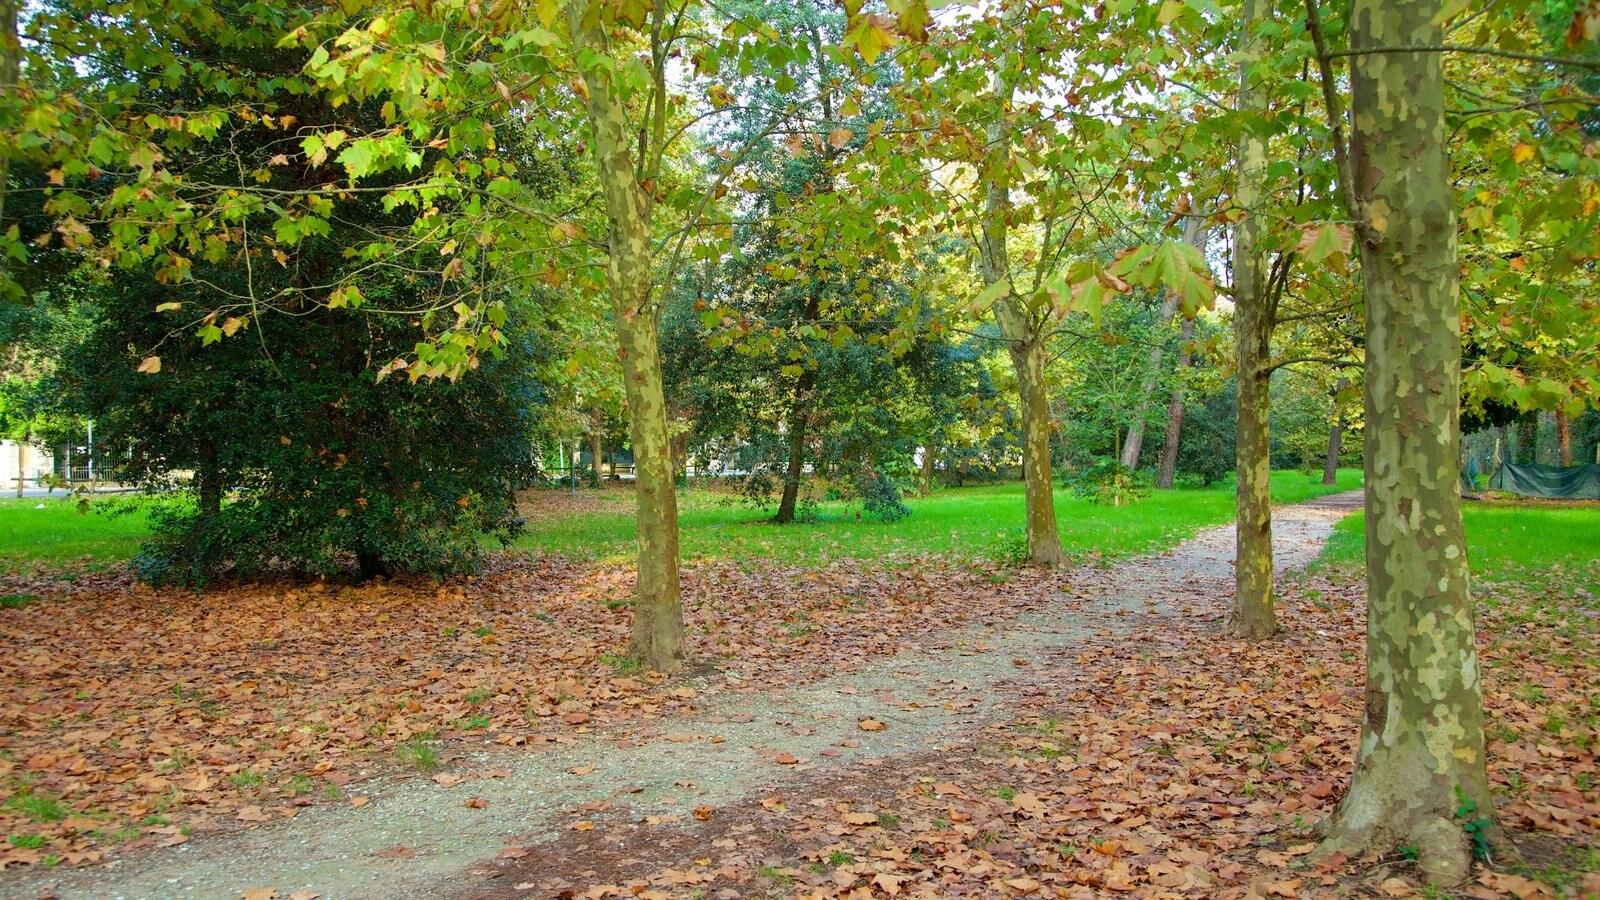 Pineta di Ponente featuring a garden and autumn leaves